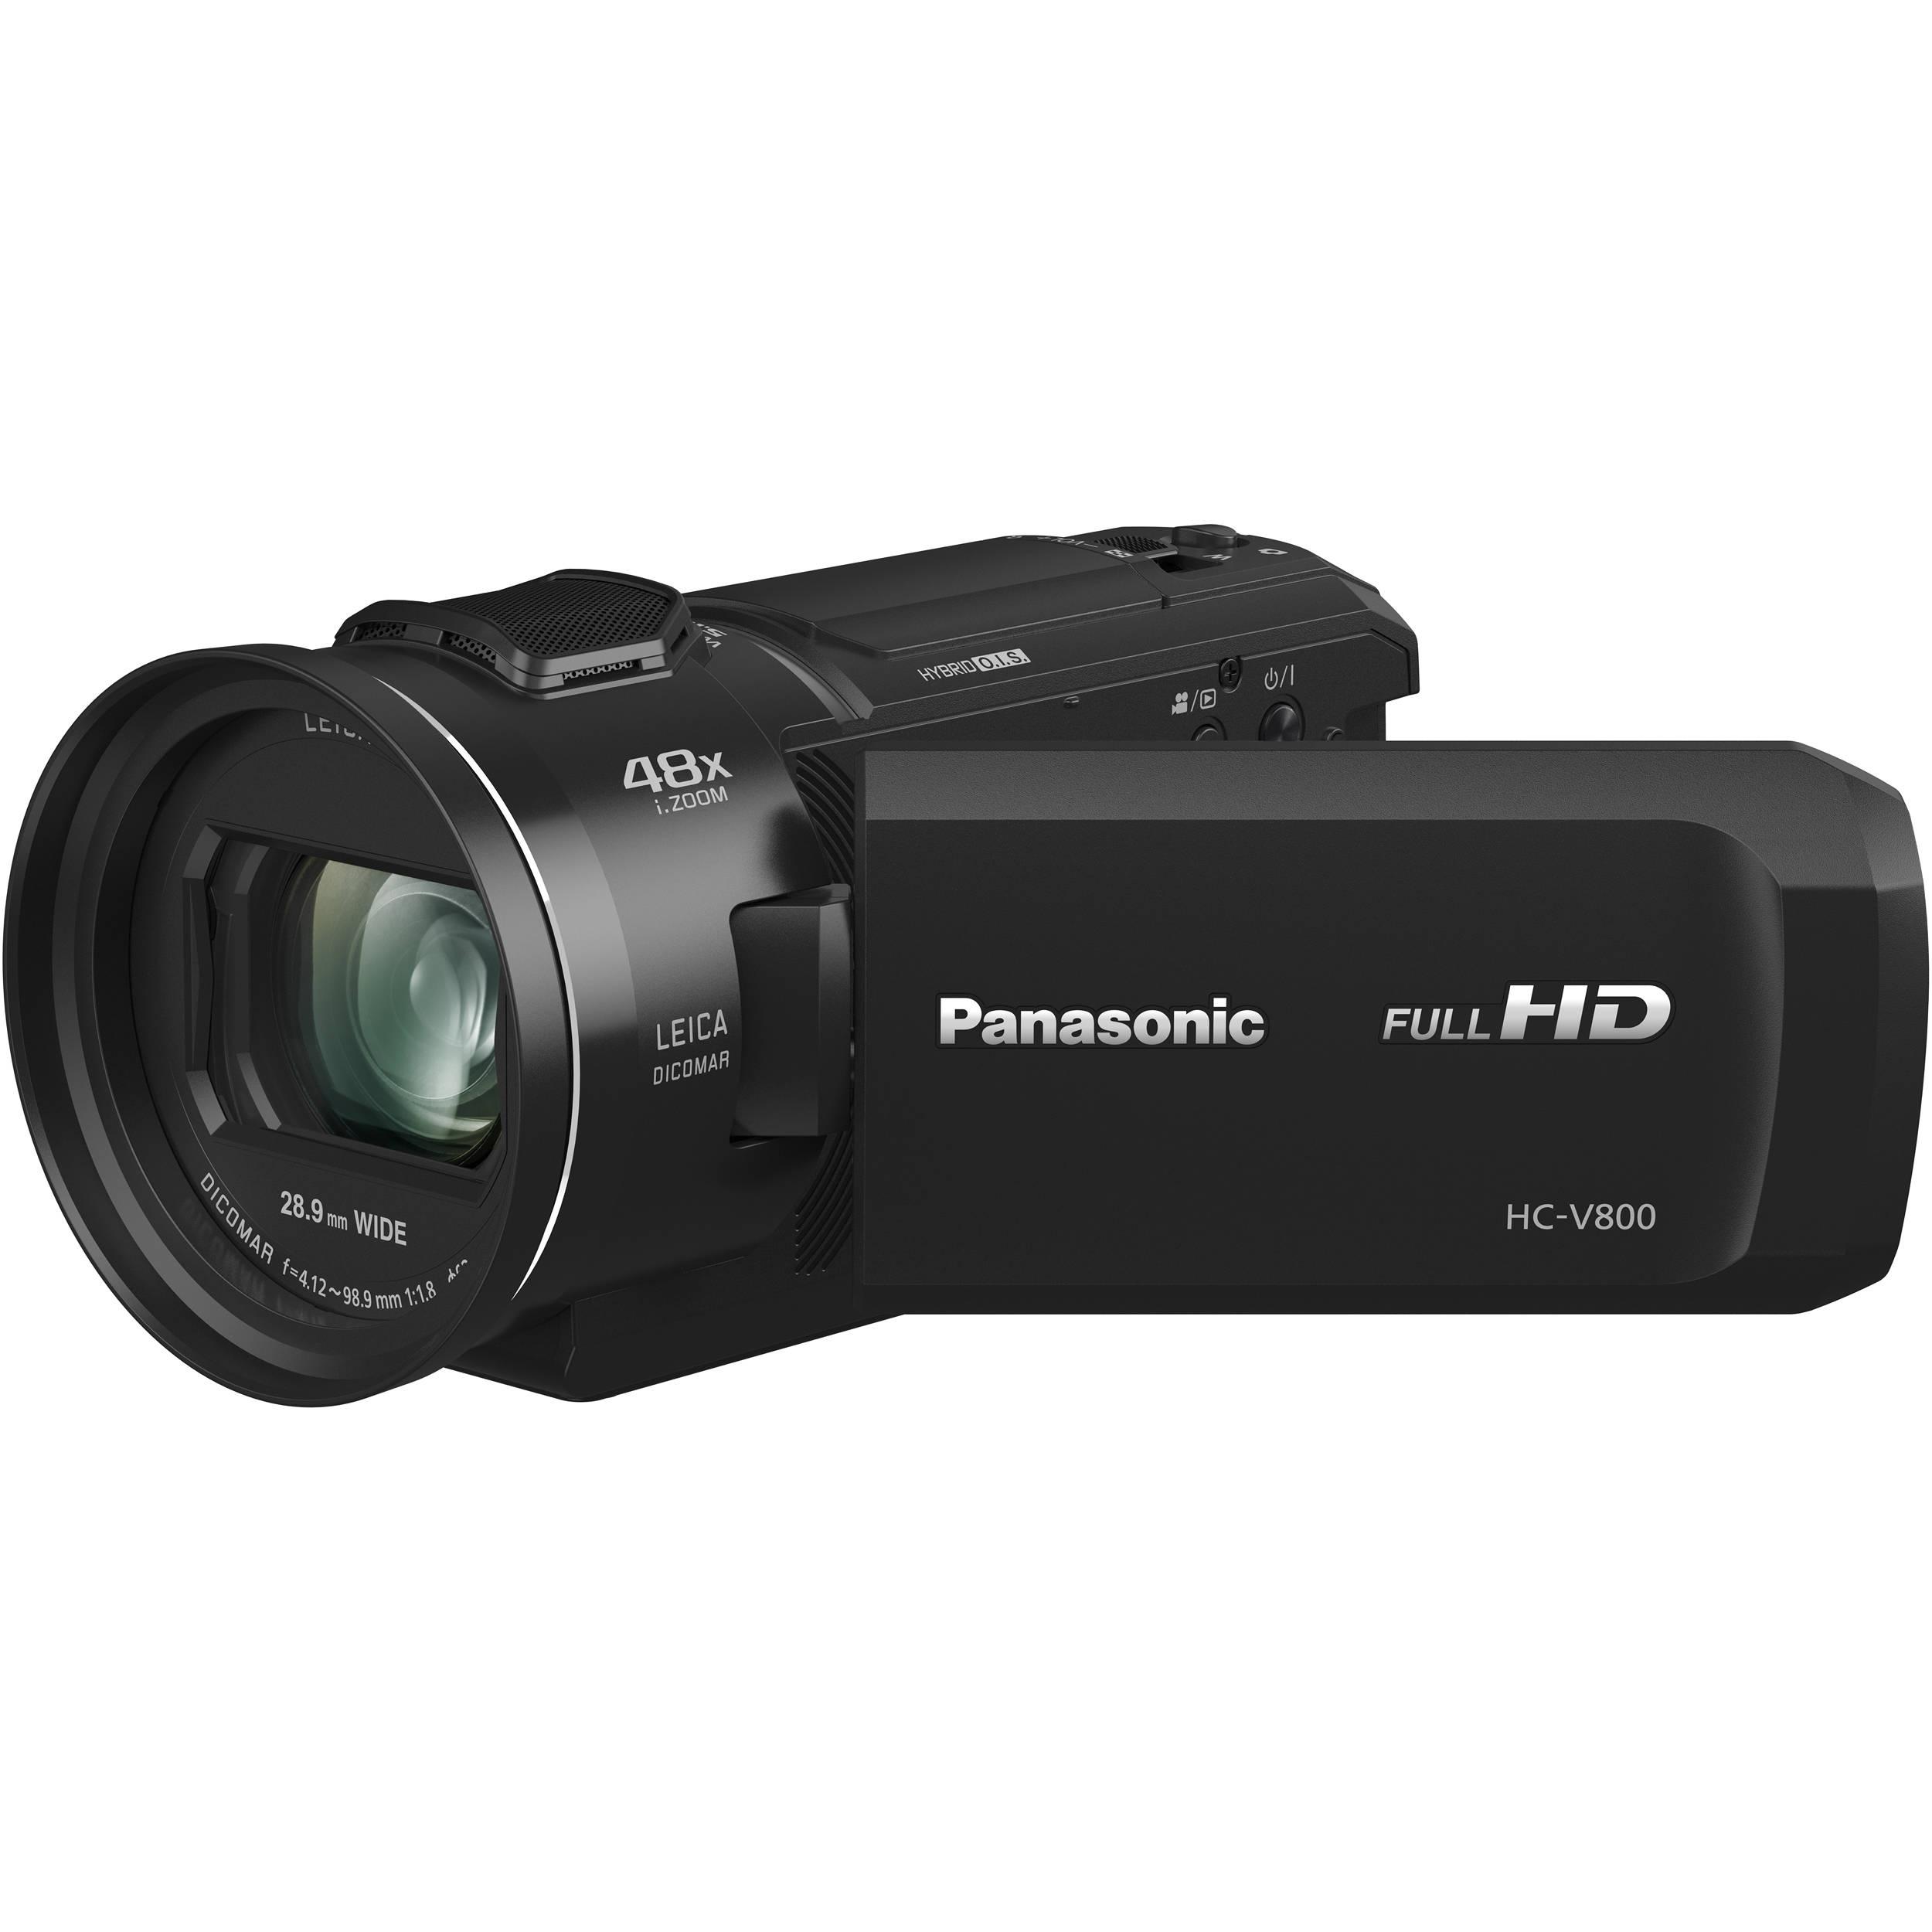 panasonic hc v800 full hd camcorder hc v800k b h photo video. Black Bedroom Furniture Sets. Home Design Ideas